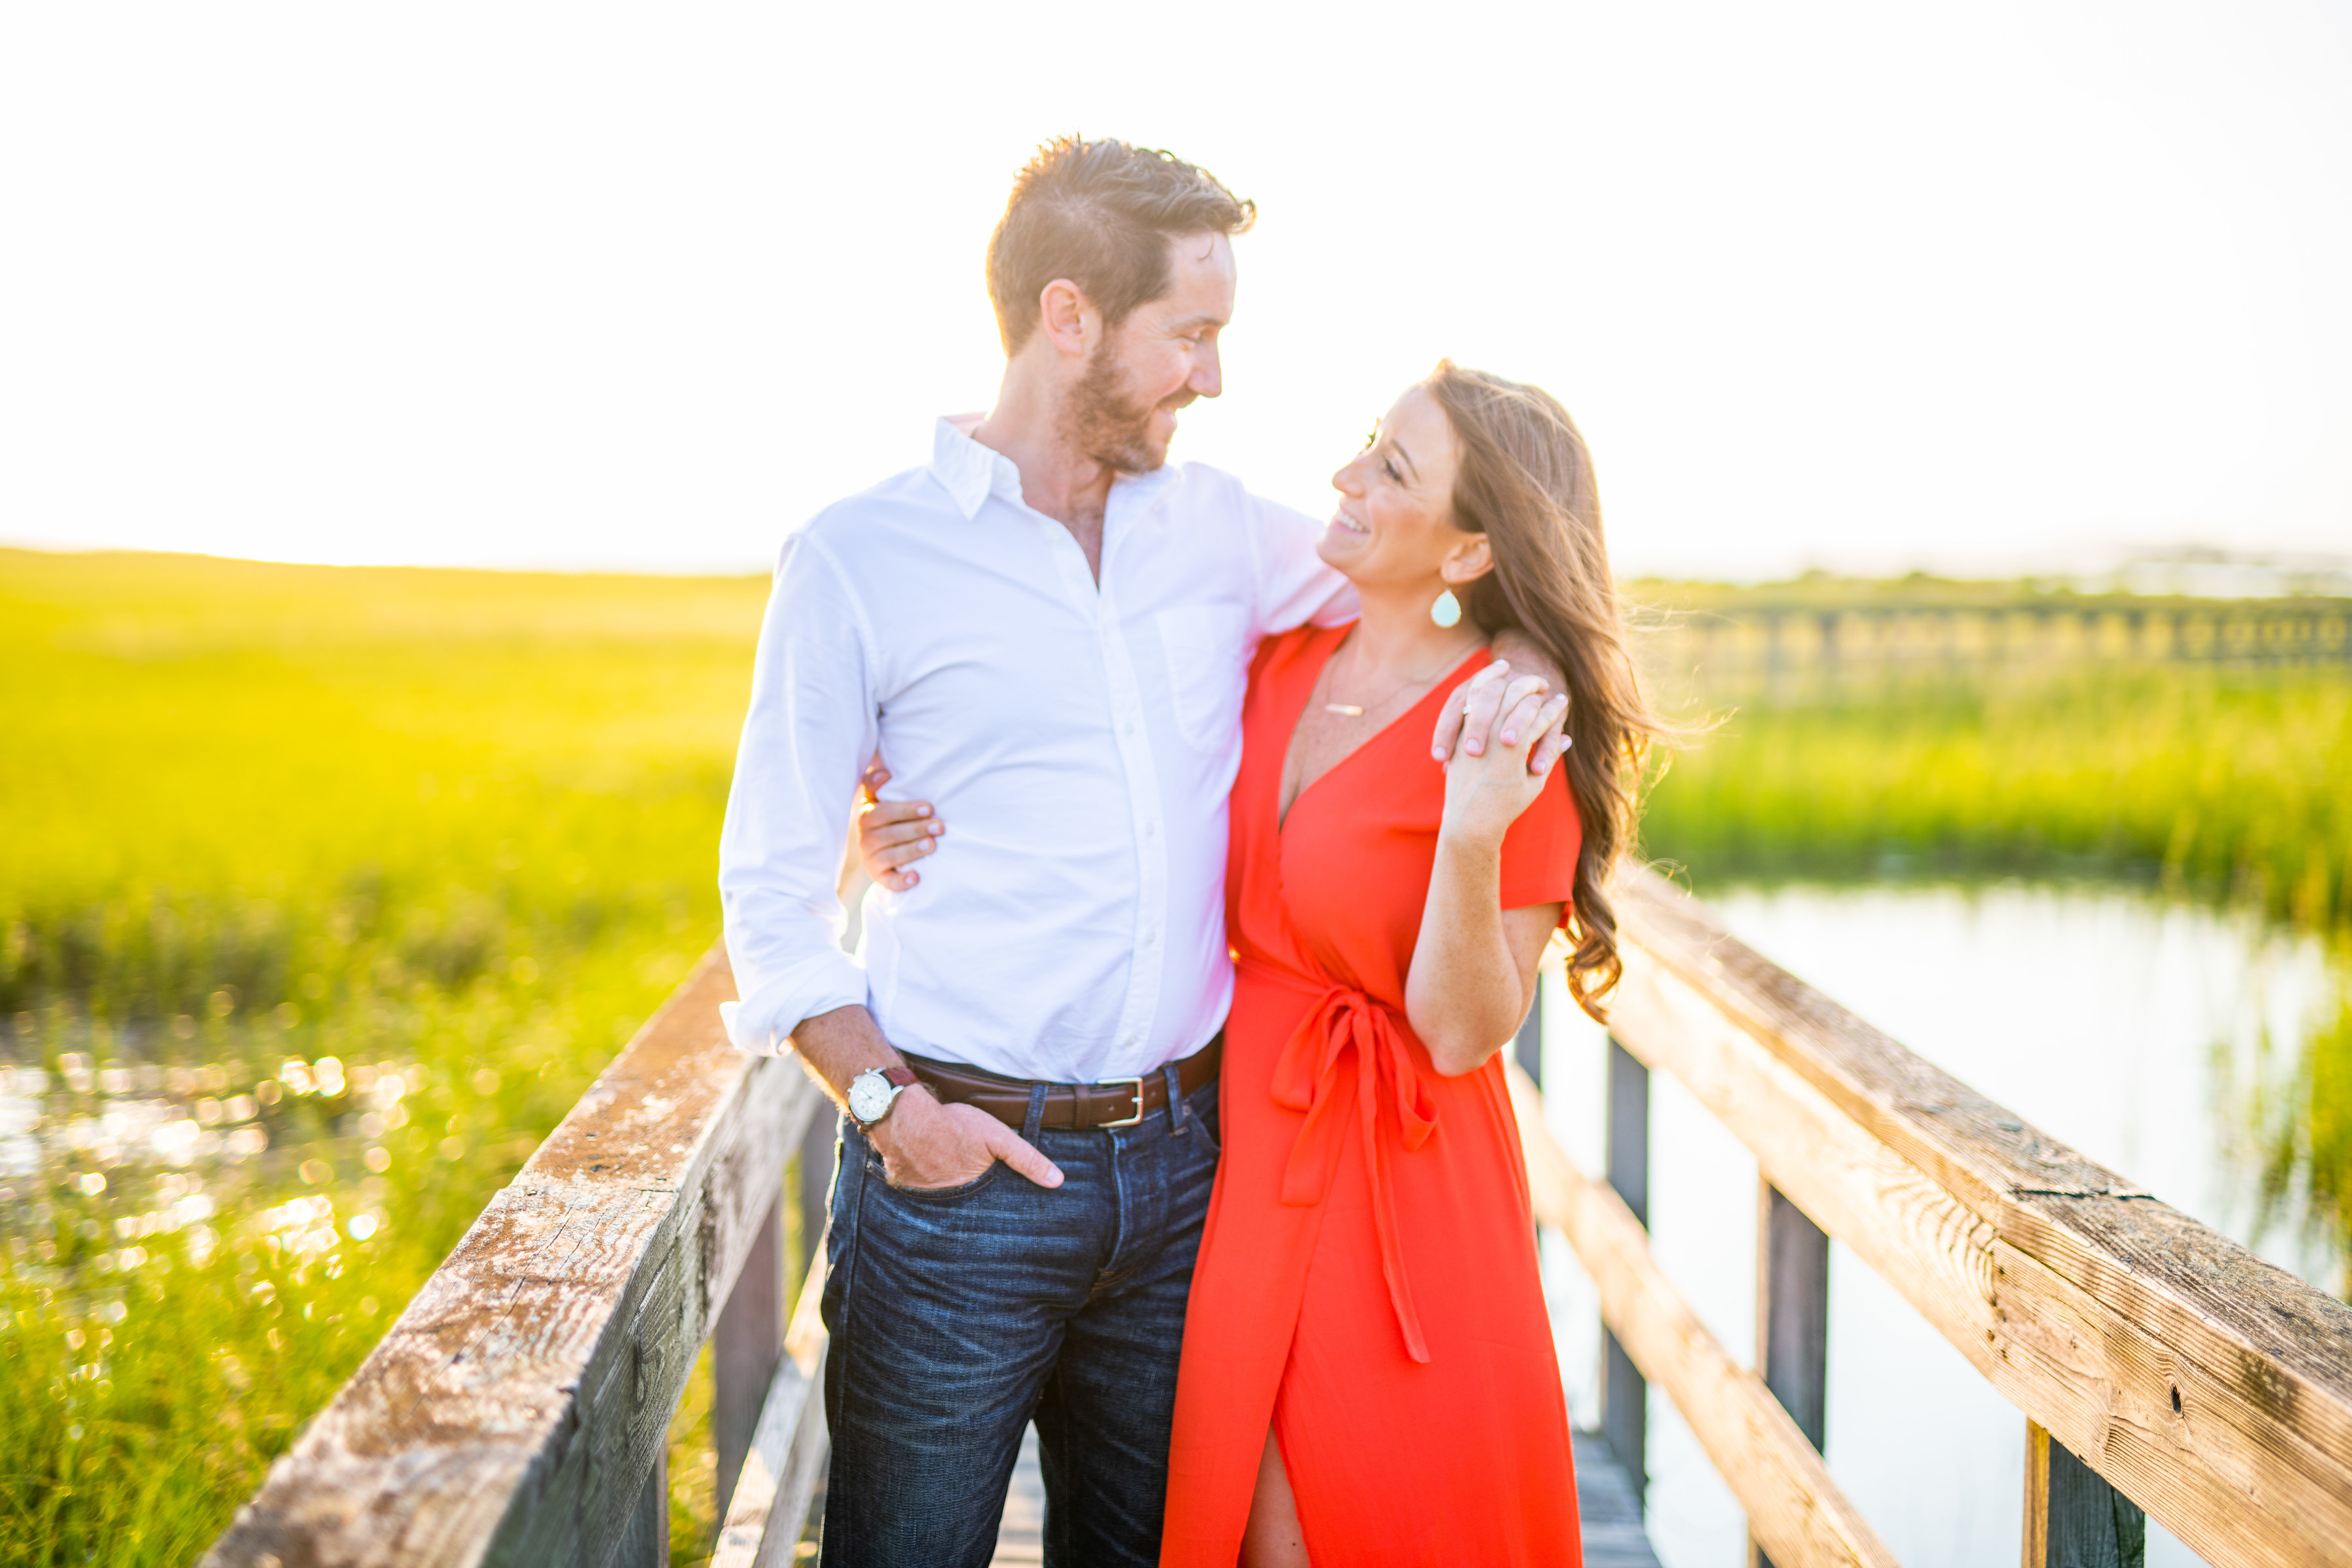 Southampton Engagement Shoot | Southampton Wedding Photographer | Hamptons Engagement Shoot | Hamptons Wedding Photographer20